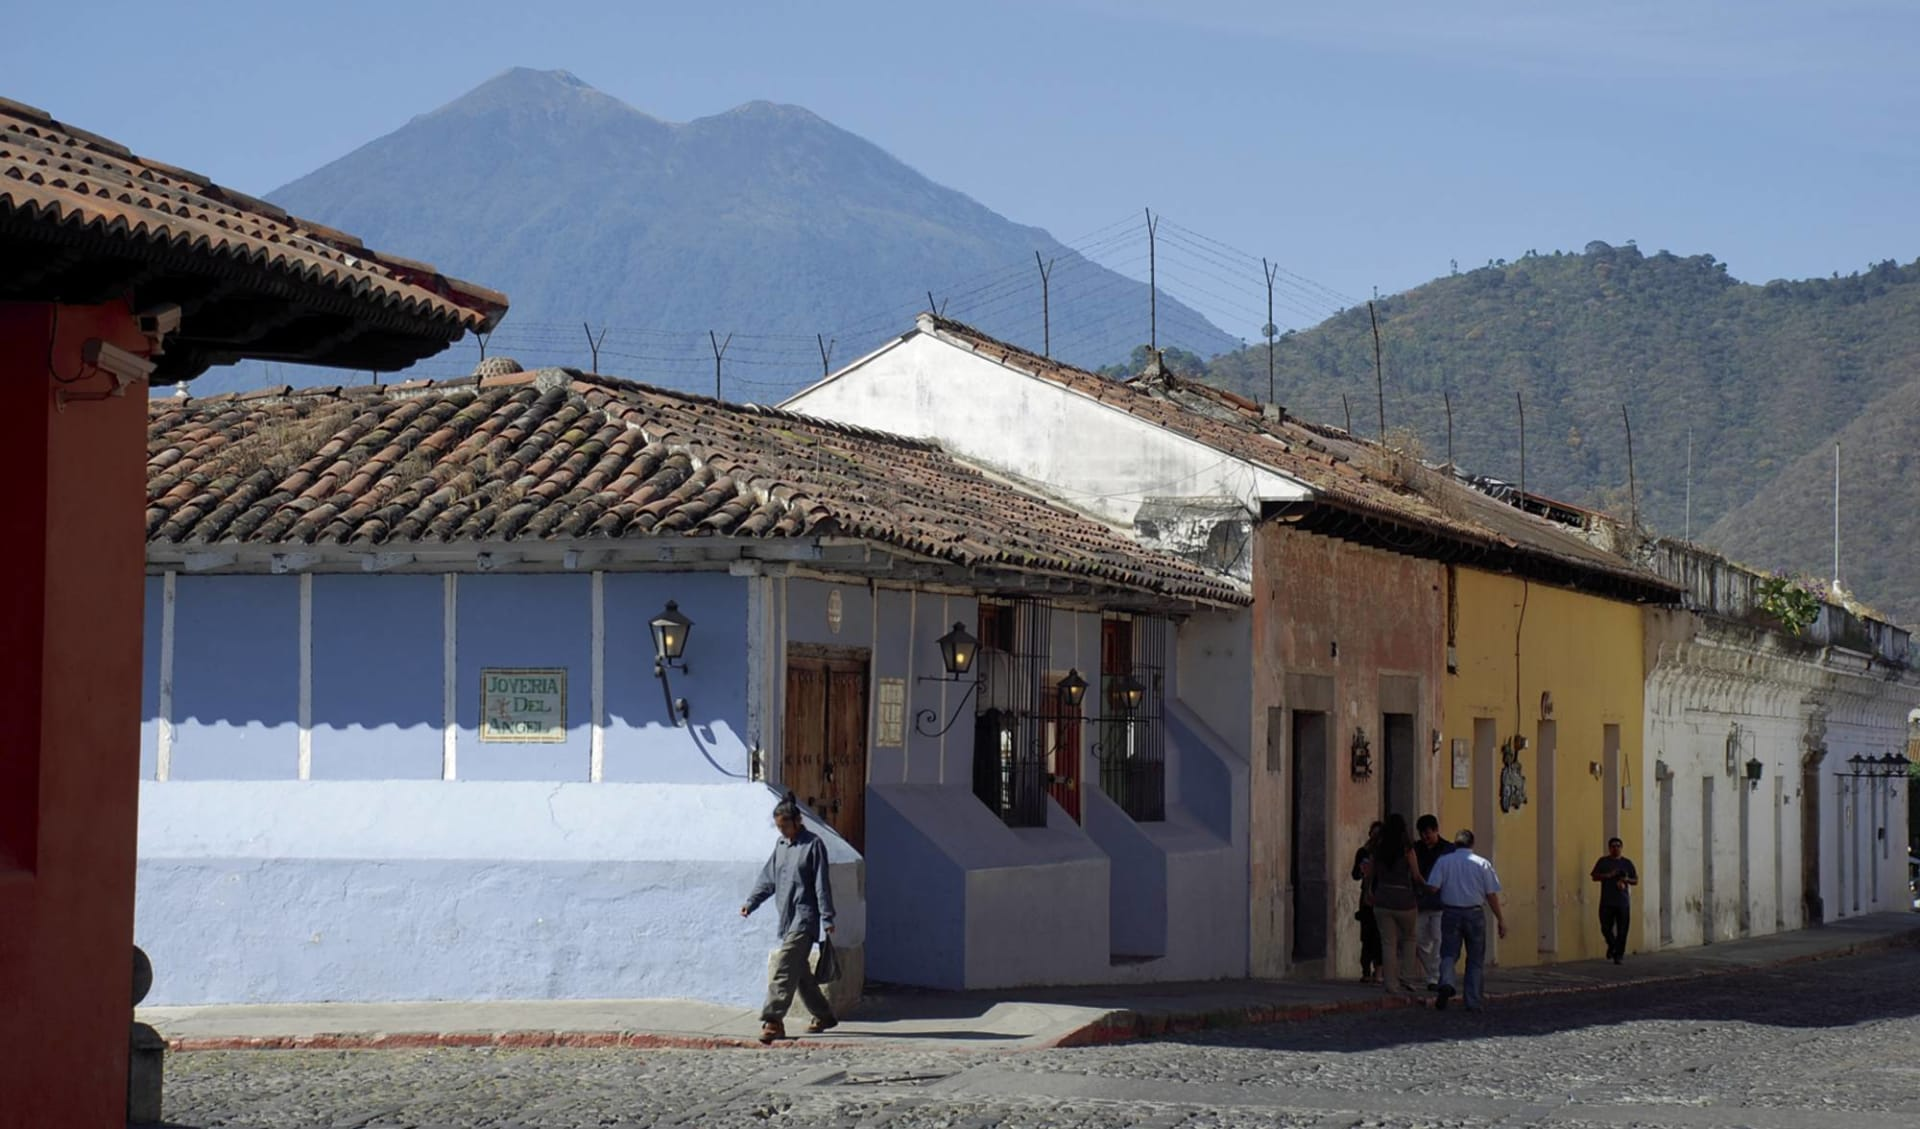 Gruppenreise Mundo Maya ab Guatemala City: stadt höhepunkte guatemala antigua